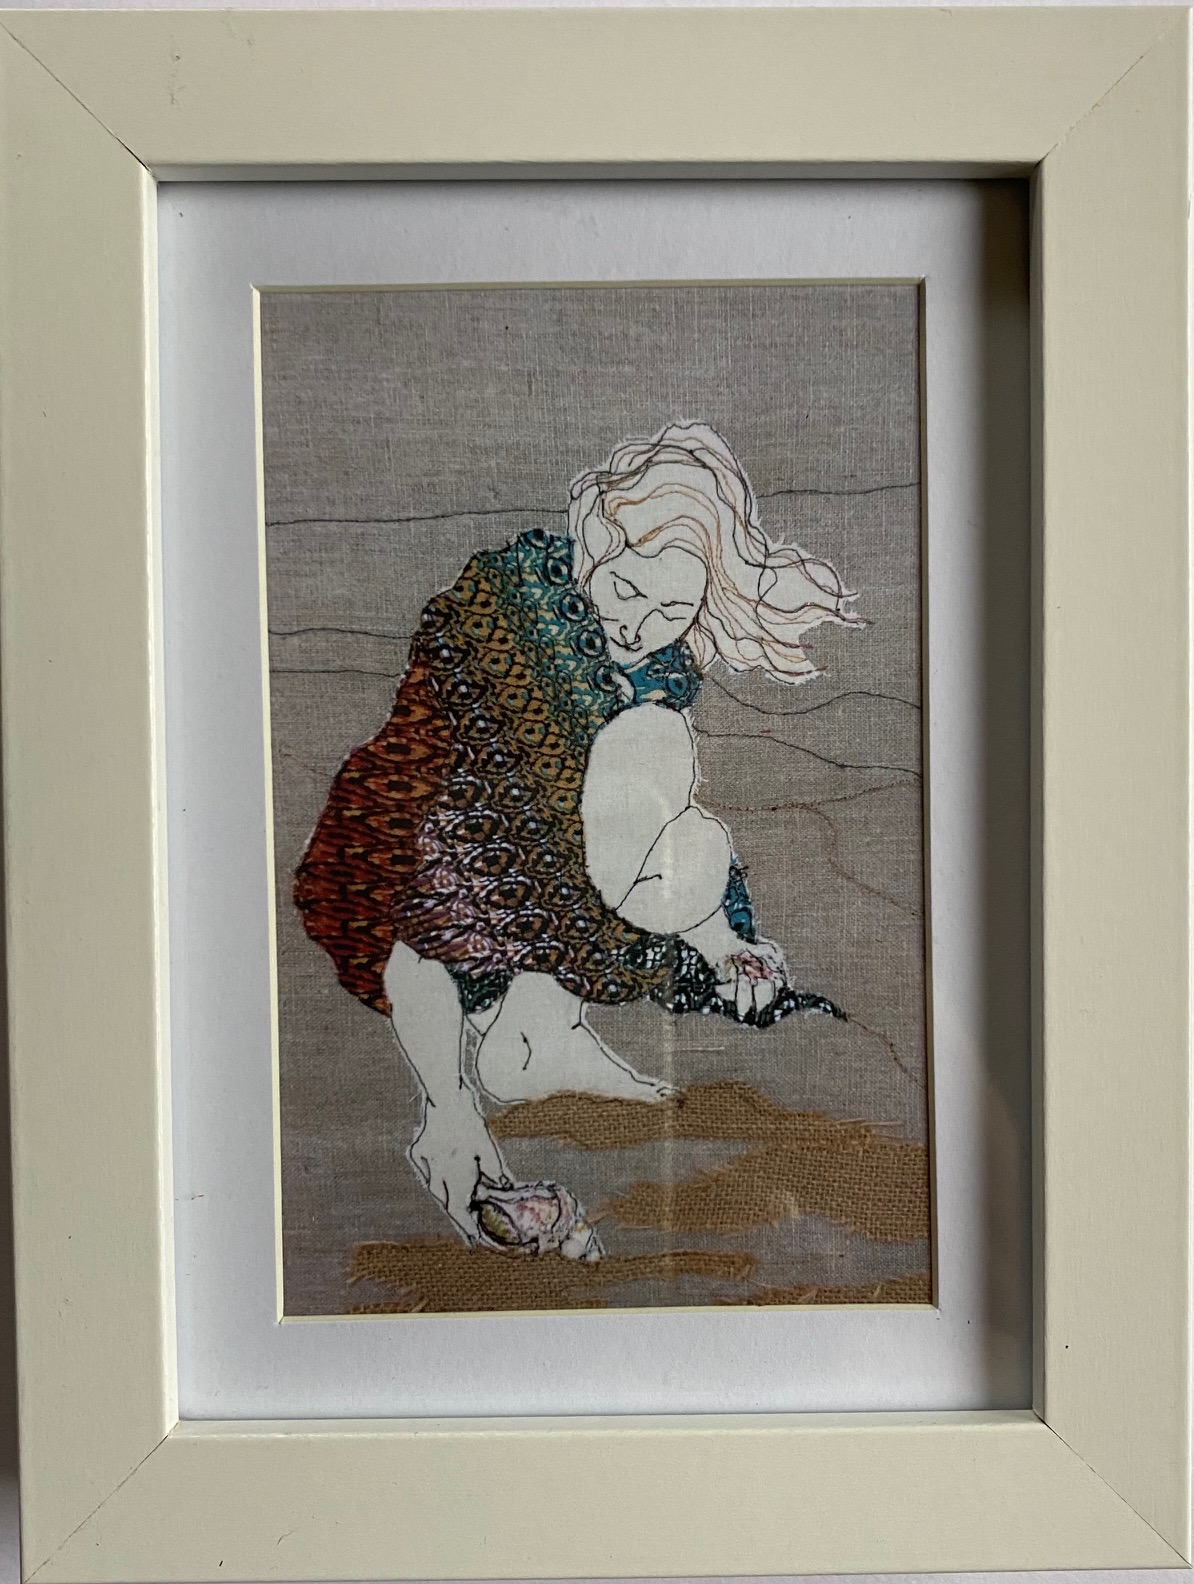 shellfinder-artwork-print-by-juliet-d-collins-by-julietdcollins